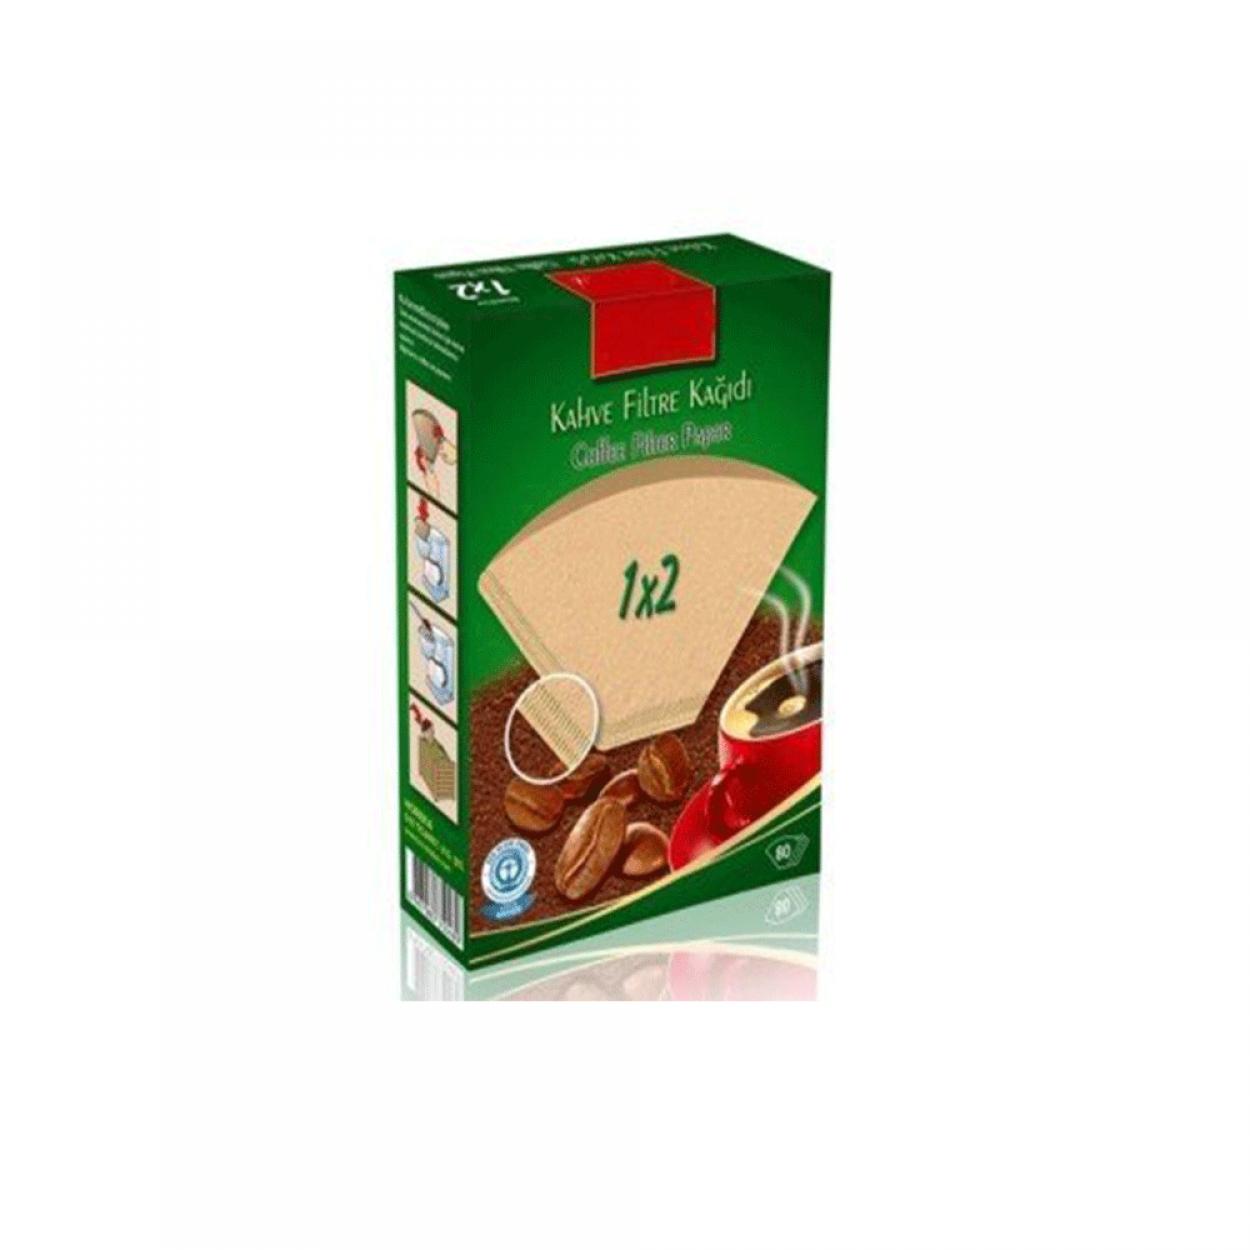 Caffeo Filtre Kahve Kağıdı 1x2 80'li Paket